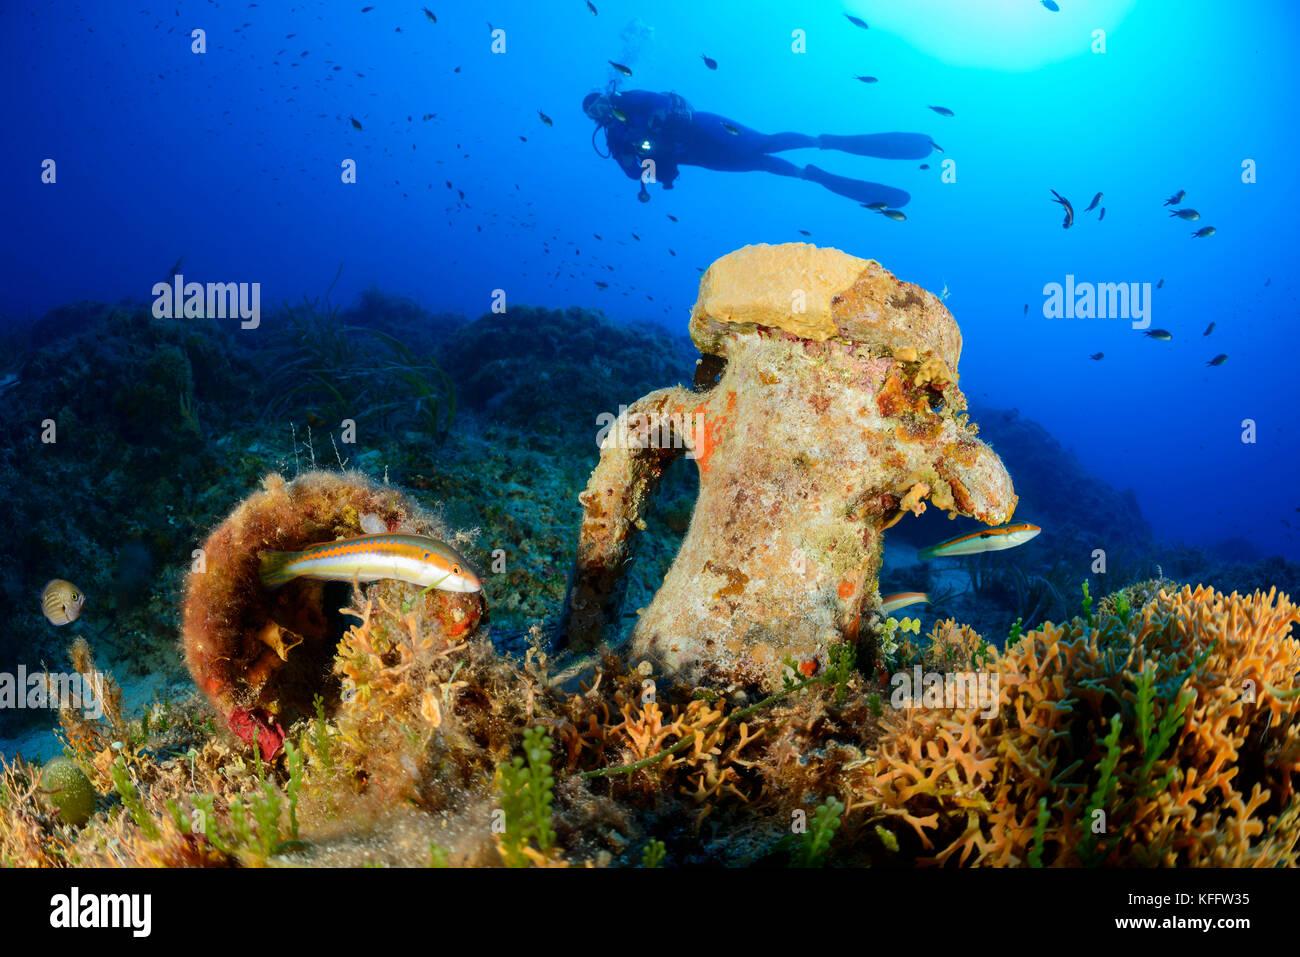 Amphora underwater and scuba diver, Adriatic Sea, Mediterranean Sea, Island Lastovo, Dalmatia, Croatia, MR Yes - Stock Image